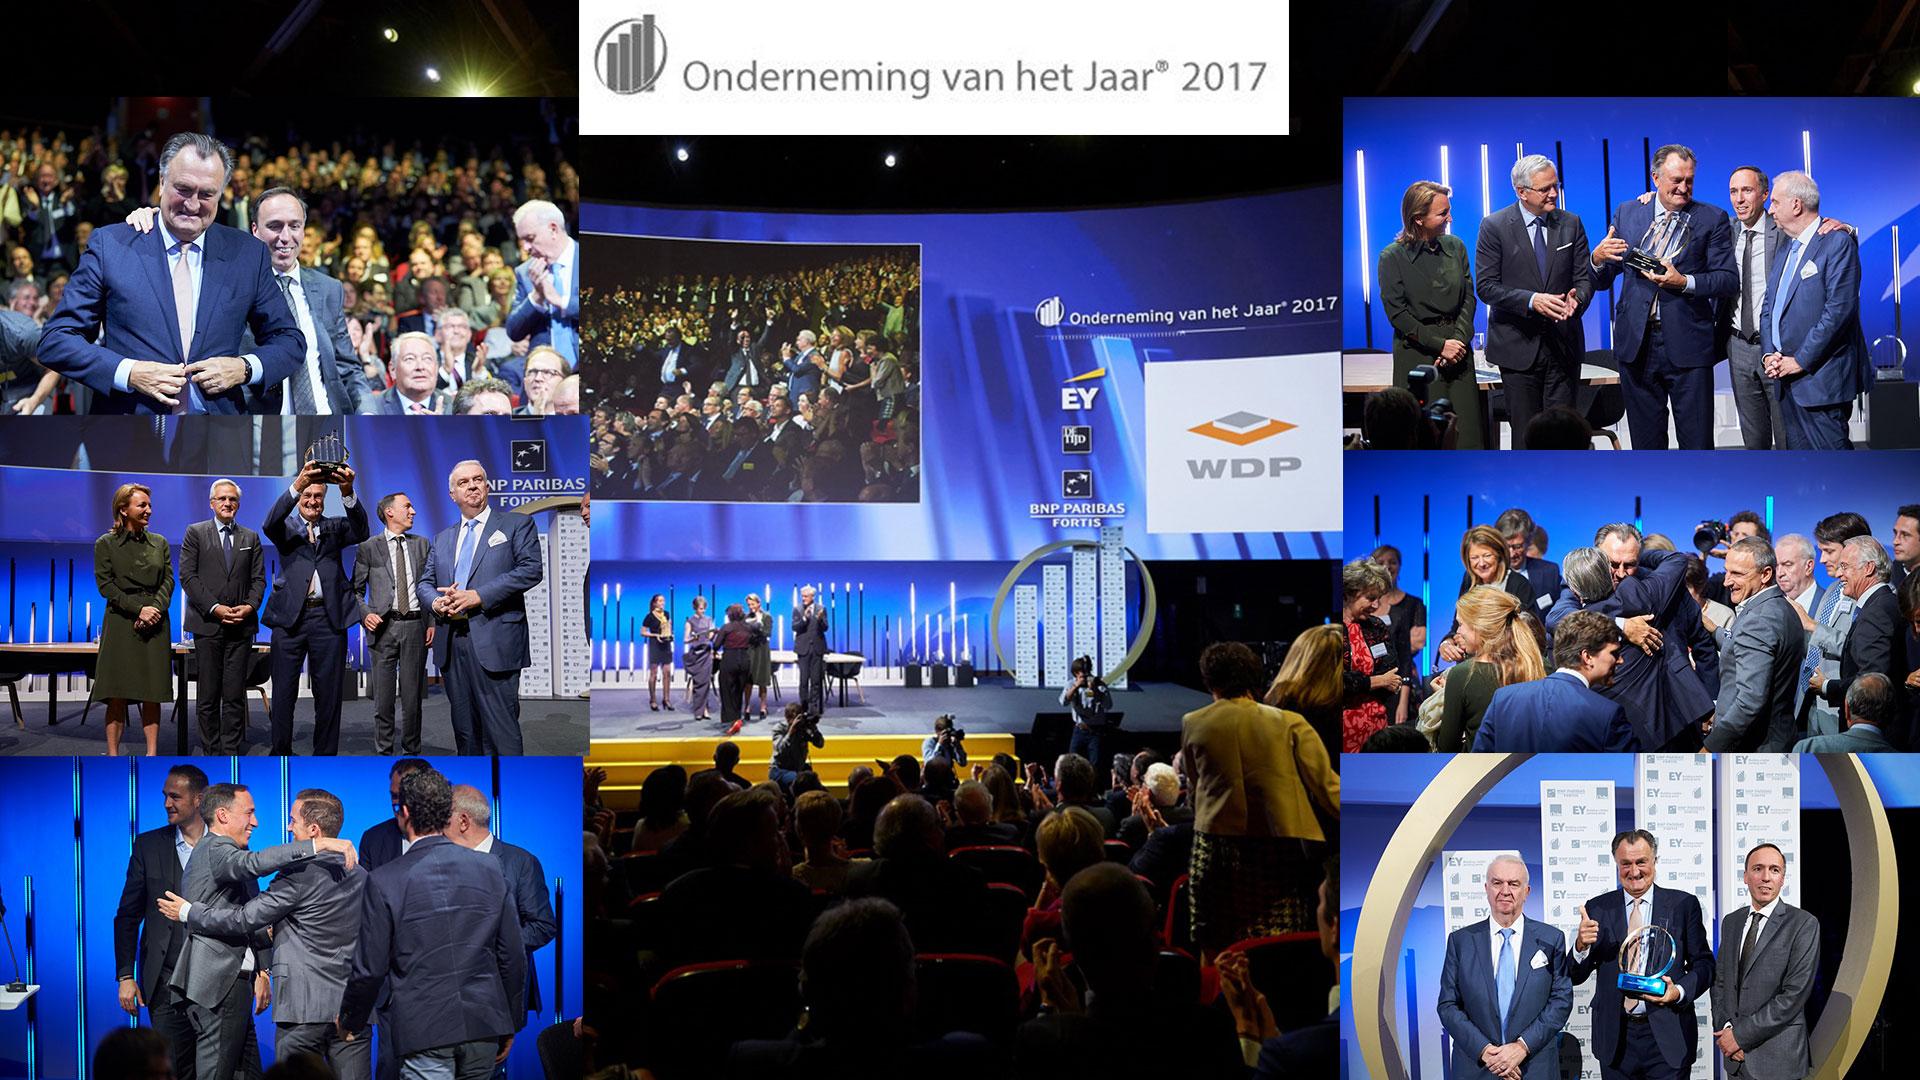 WDP Onderneming van het Jaar 2017